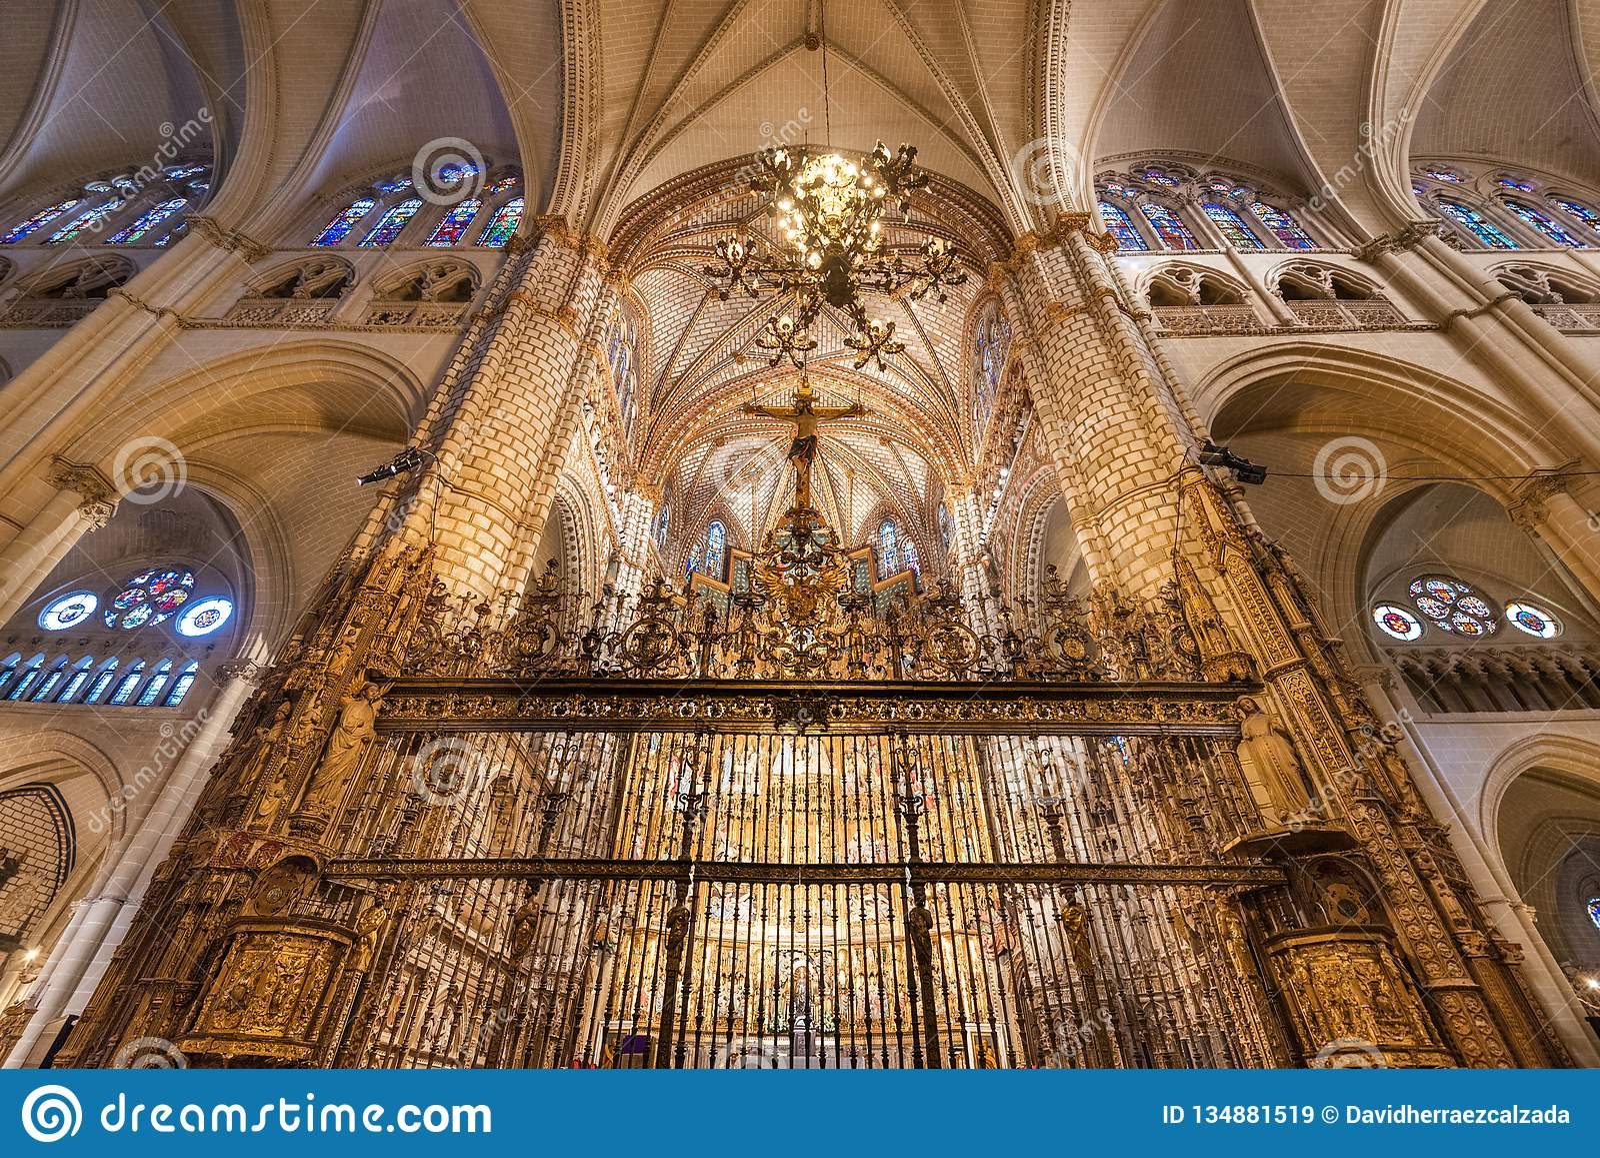 Toledo, Spain - December 16, 2018 : Interior of Toledo cathedral in historic medieval city of Toledo